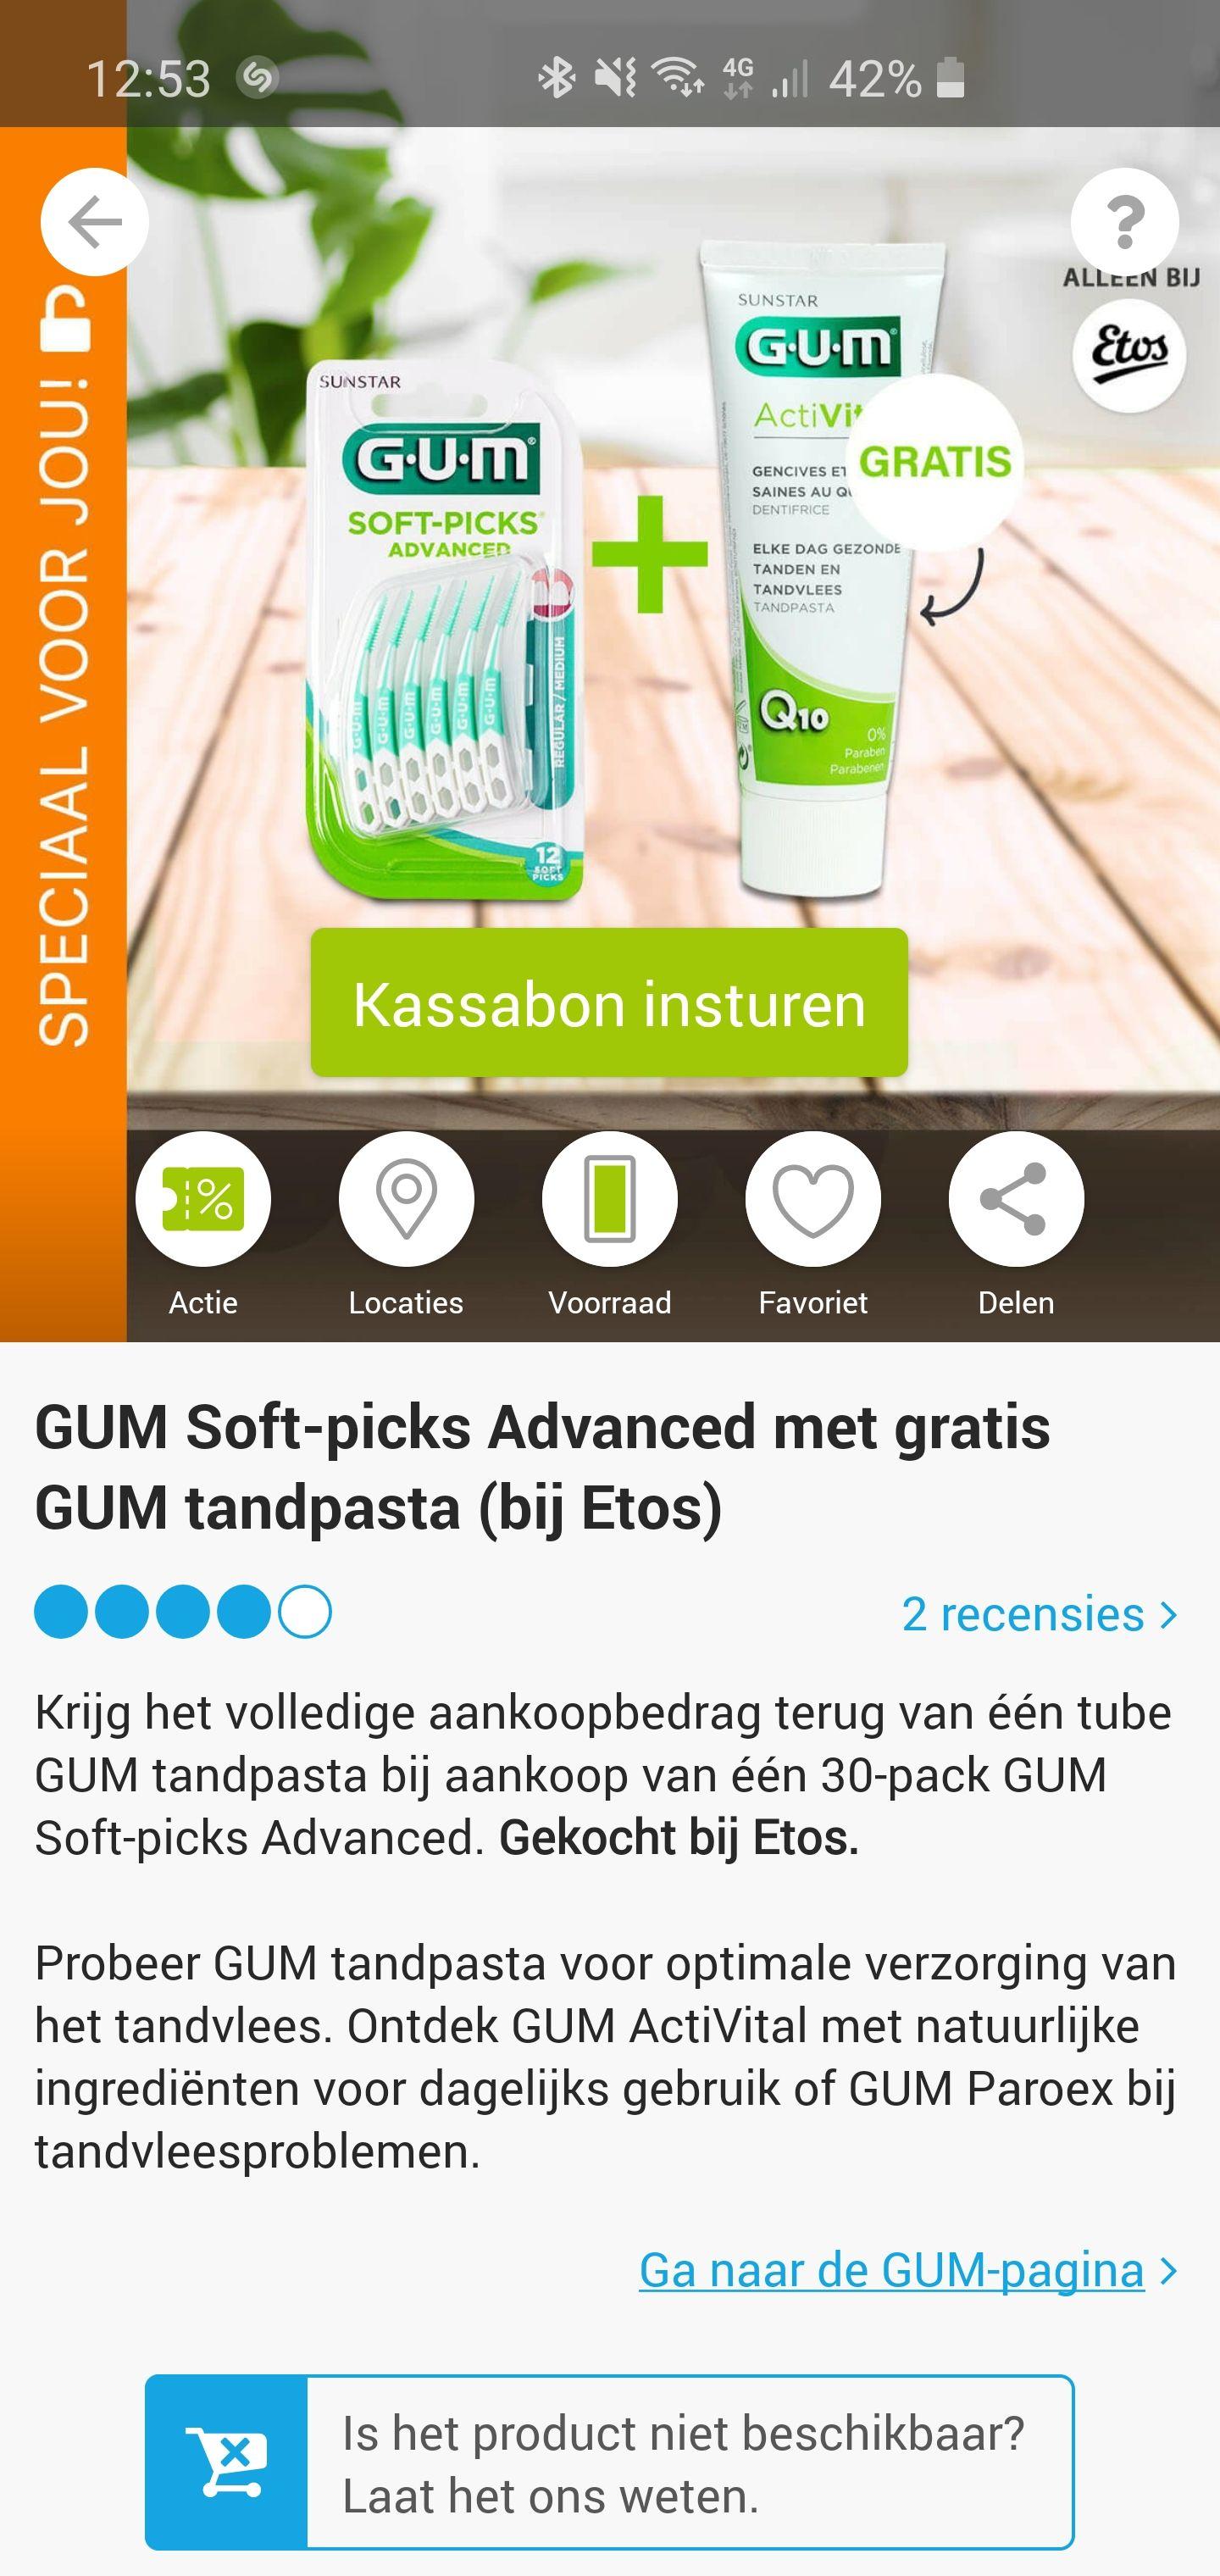 Gratis GUM tandpasta bij aankoop van één 30-pack GUM Soft-picks Advanced @ Etos (Scoupy)